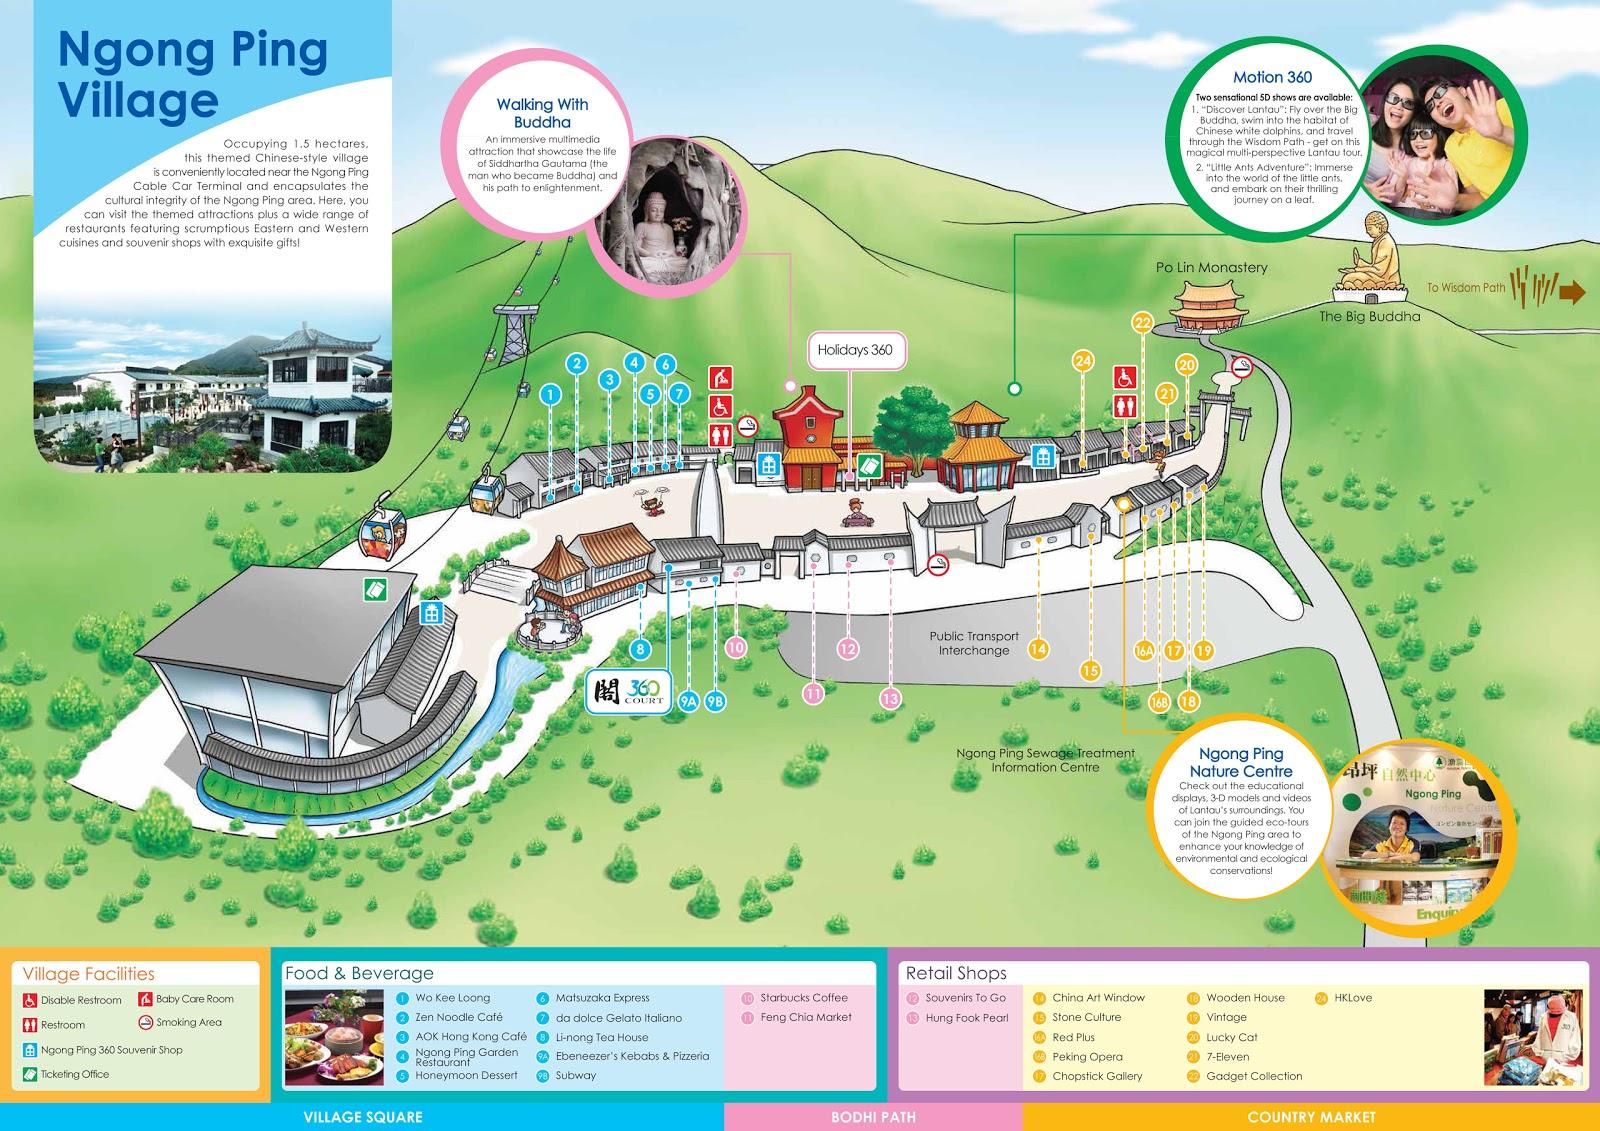 Hong kong day 1 ngong ping village tian tan buddha po lin ngong ping village map click the image to enlarge gumiabroncs Image collections